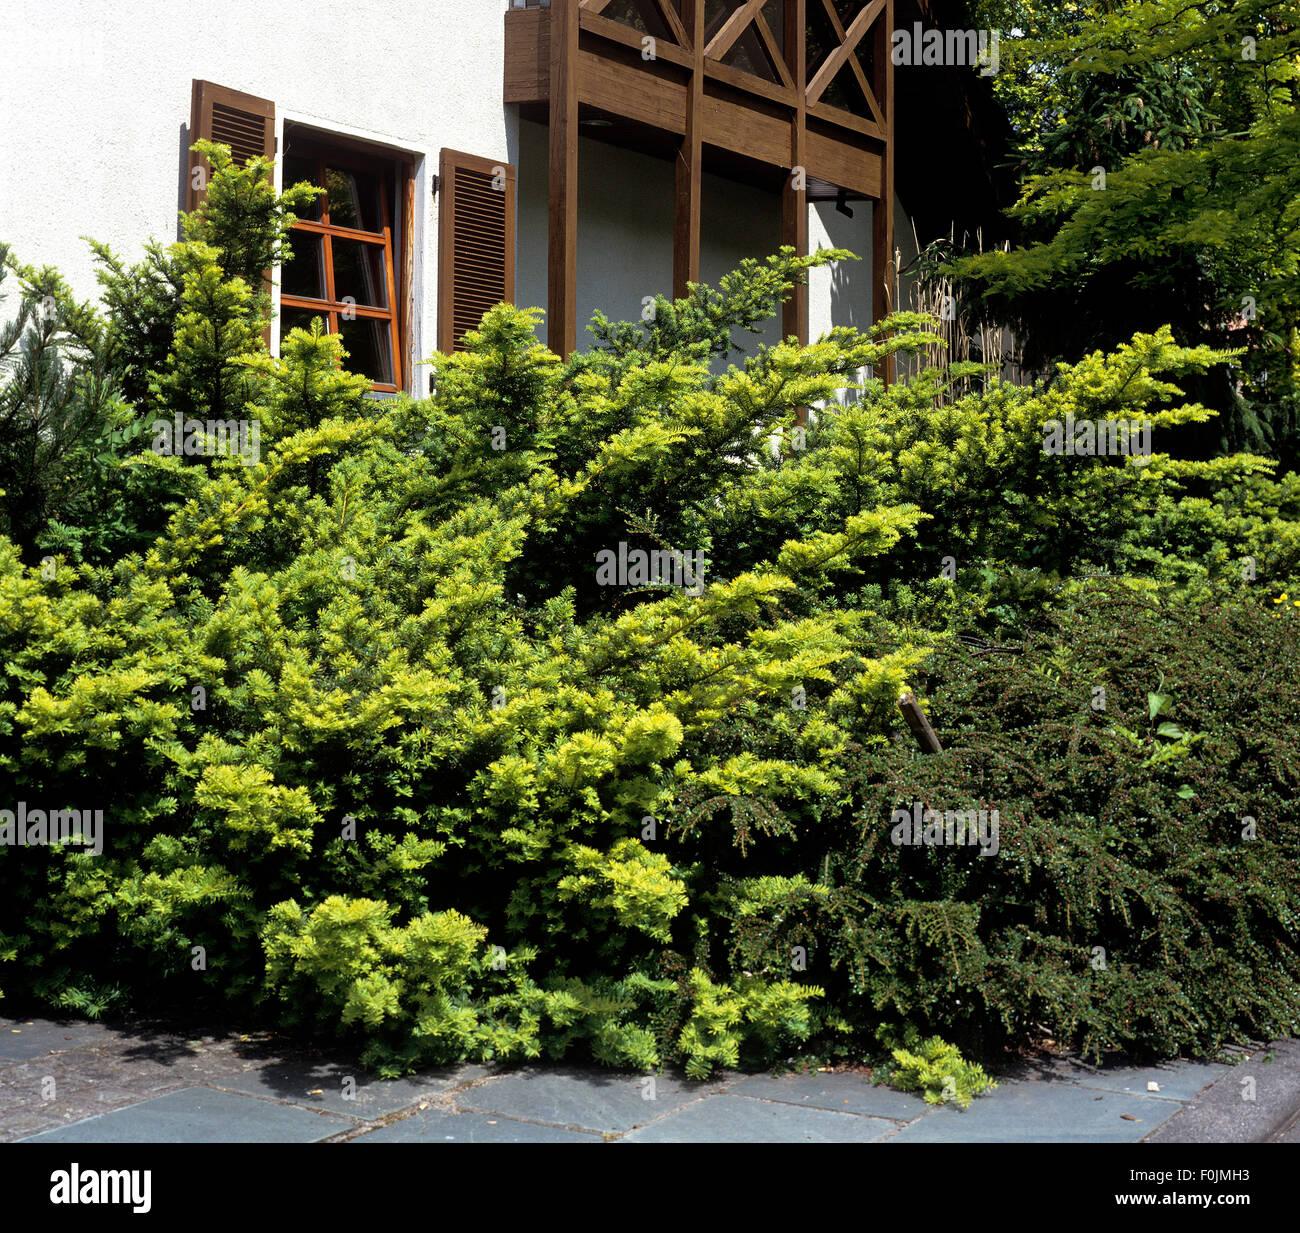 Vorgarten Stockfotos & Vorgarten Bilder